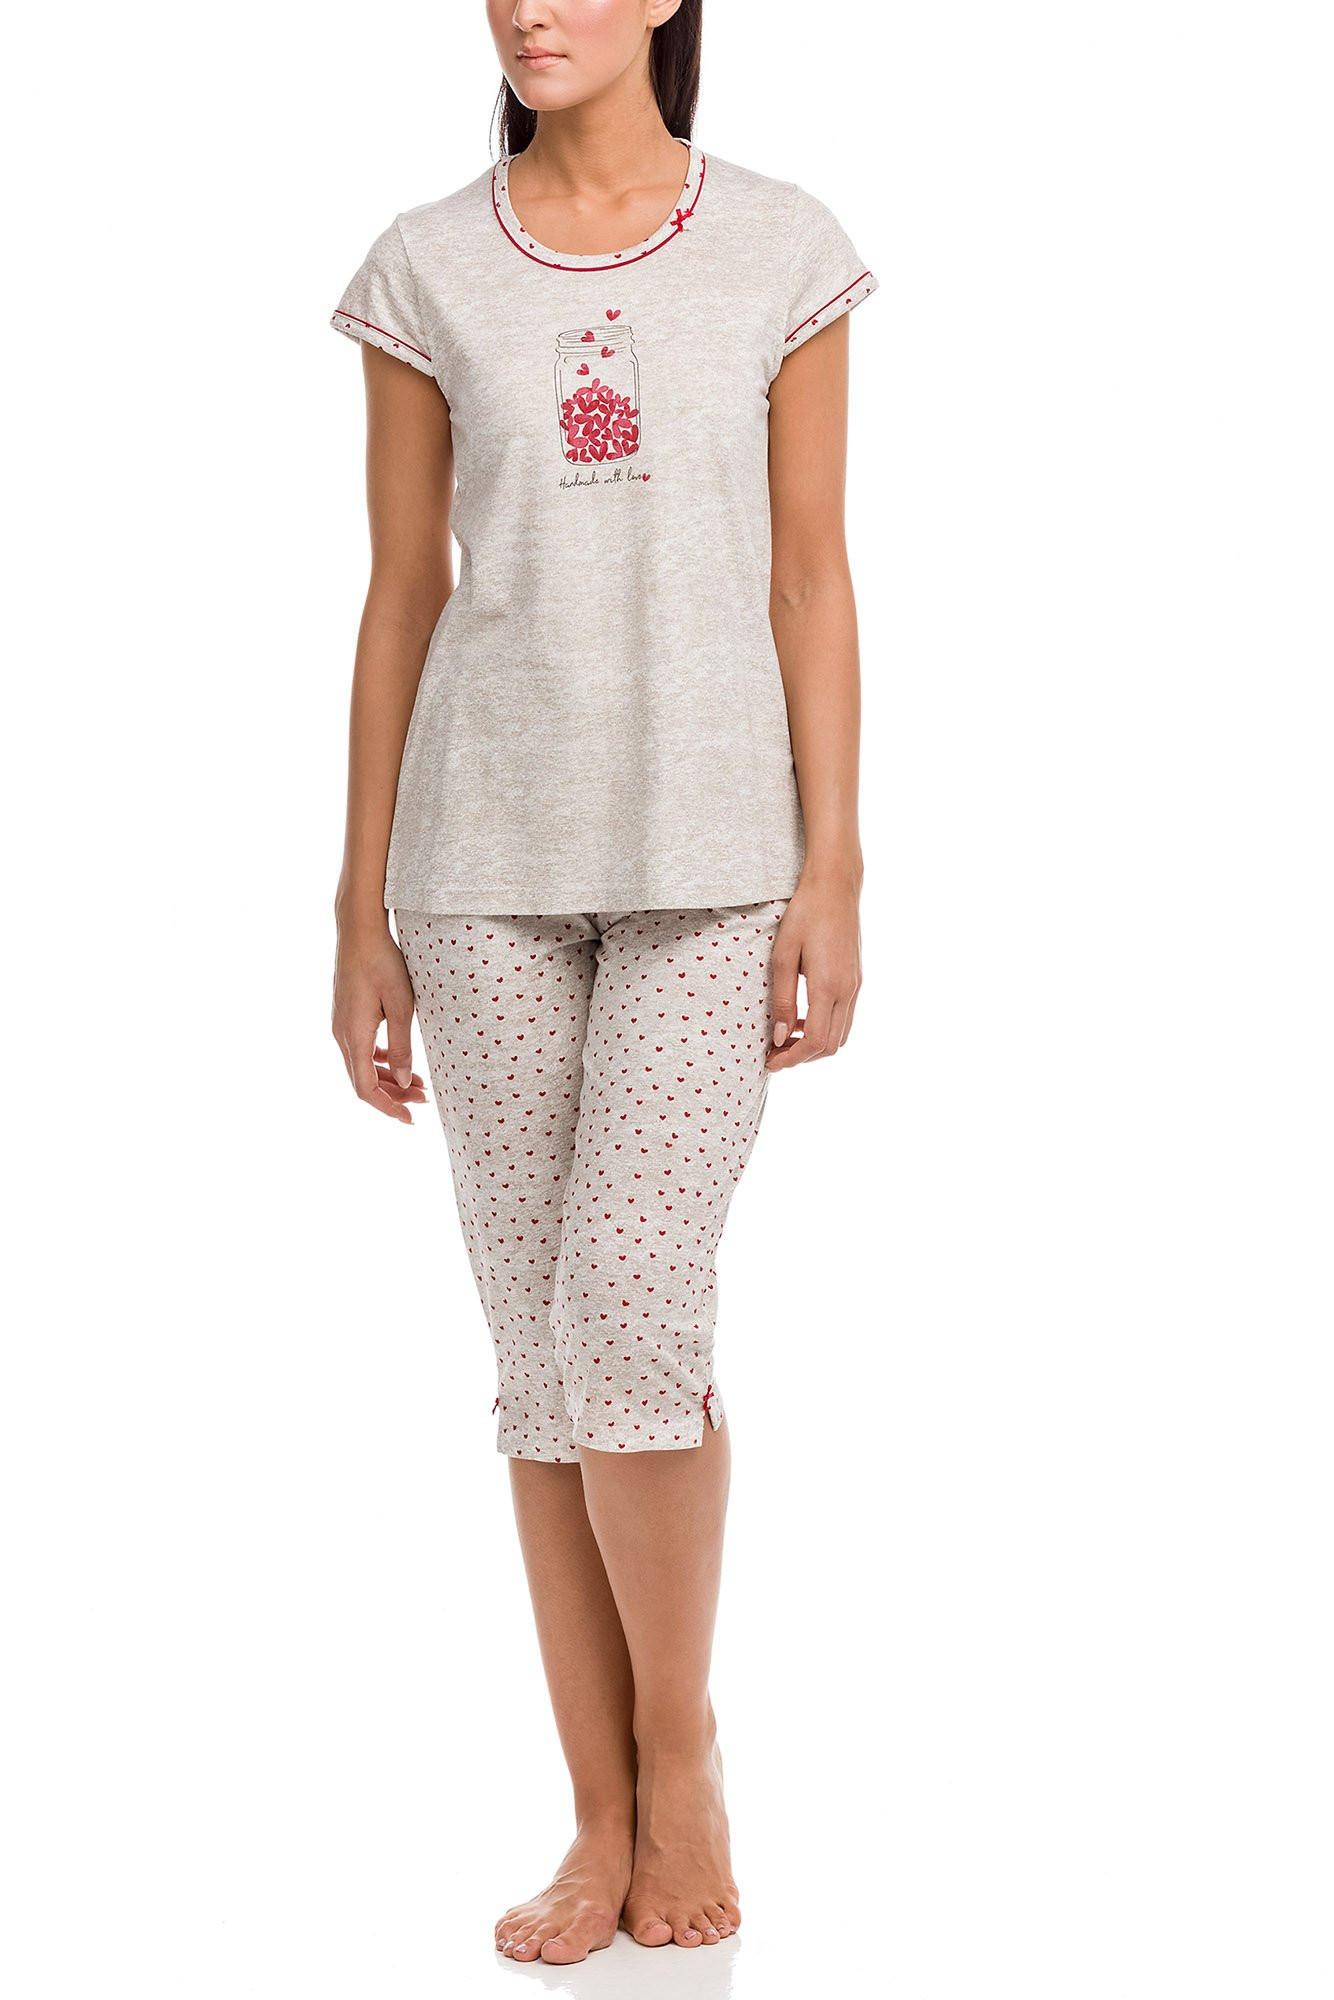 Vamp - Dámske pyžamo 12100 - Vamp beige l